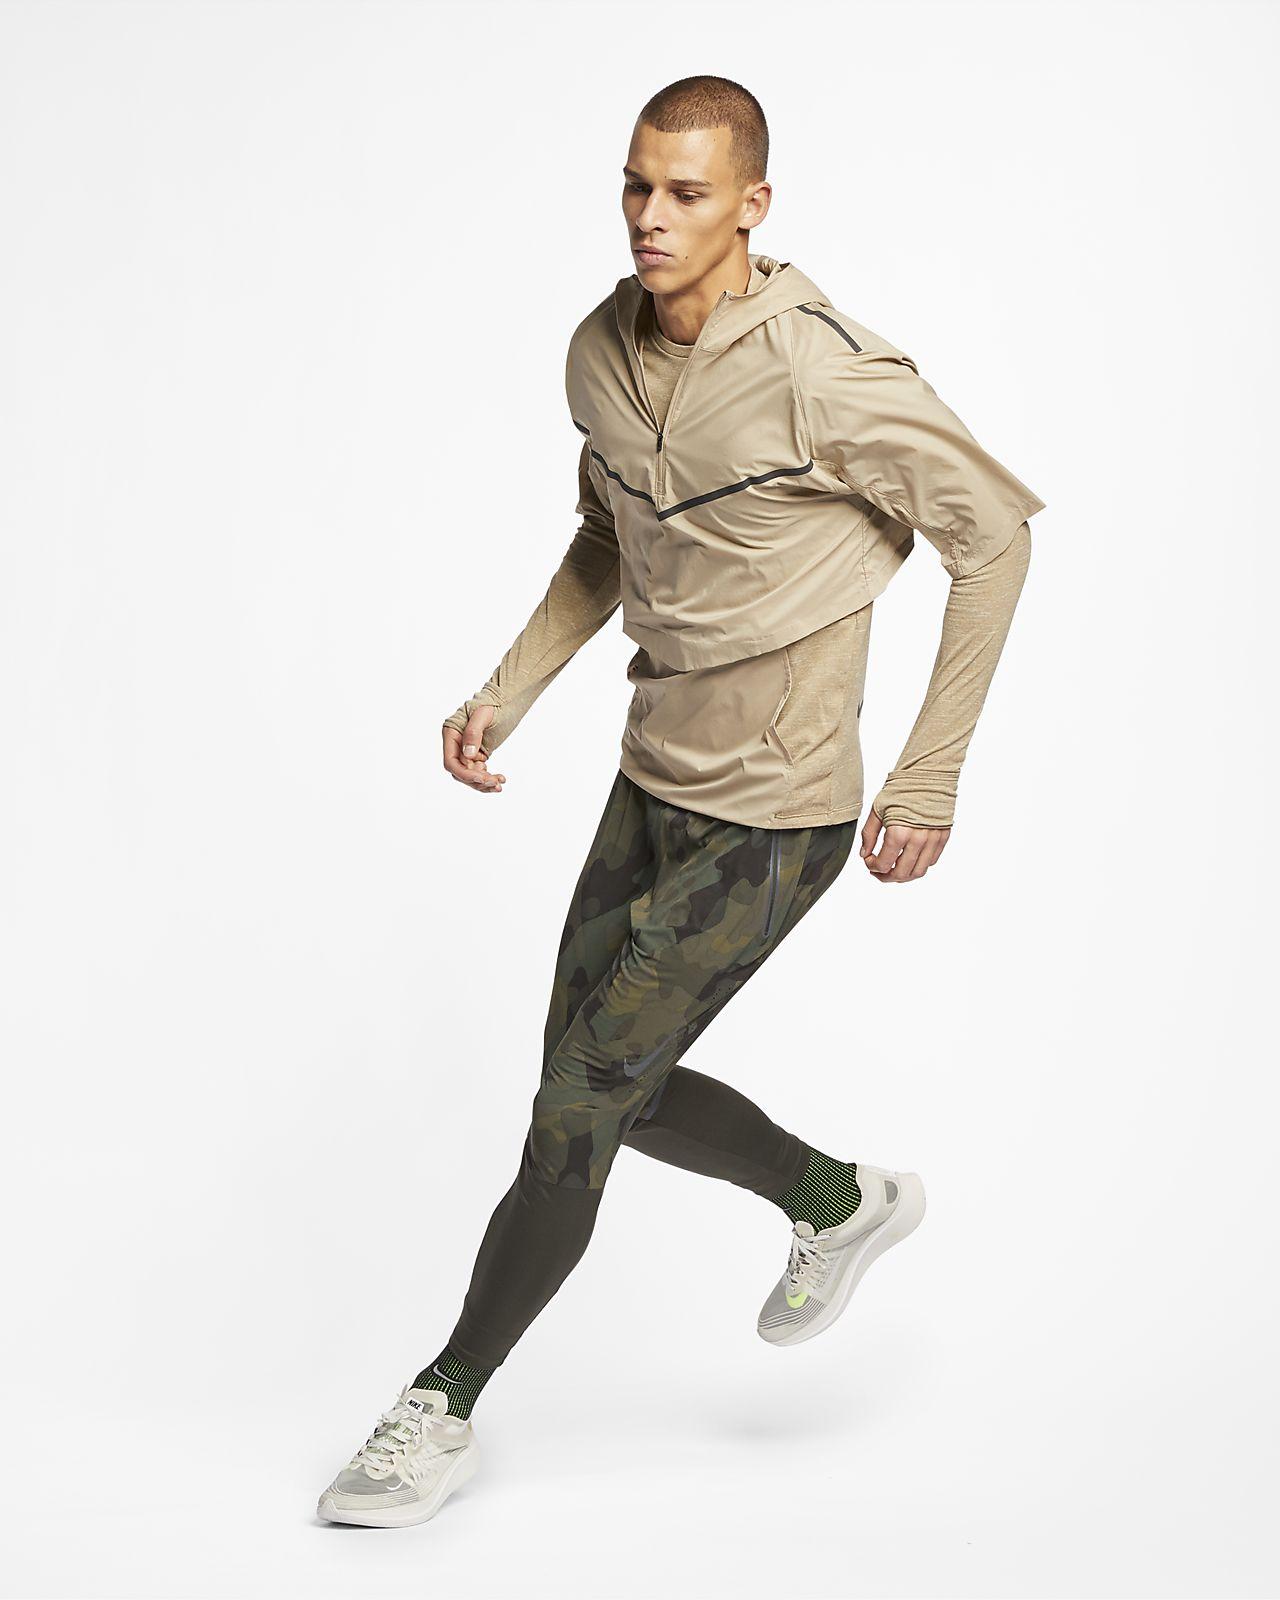 Camisola de running Nike Therma Sphere Tech Pack para homem